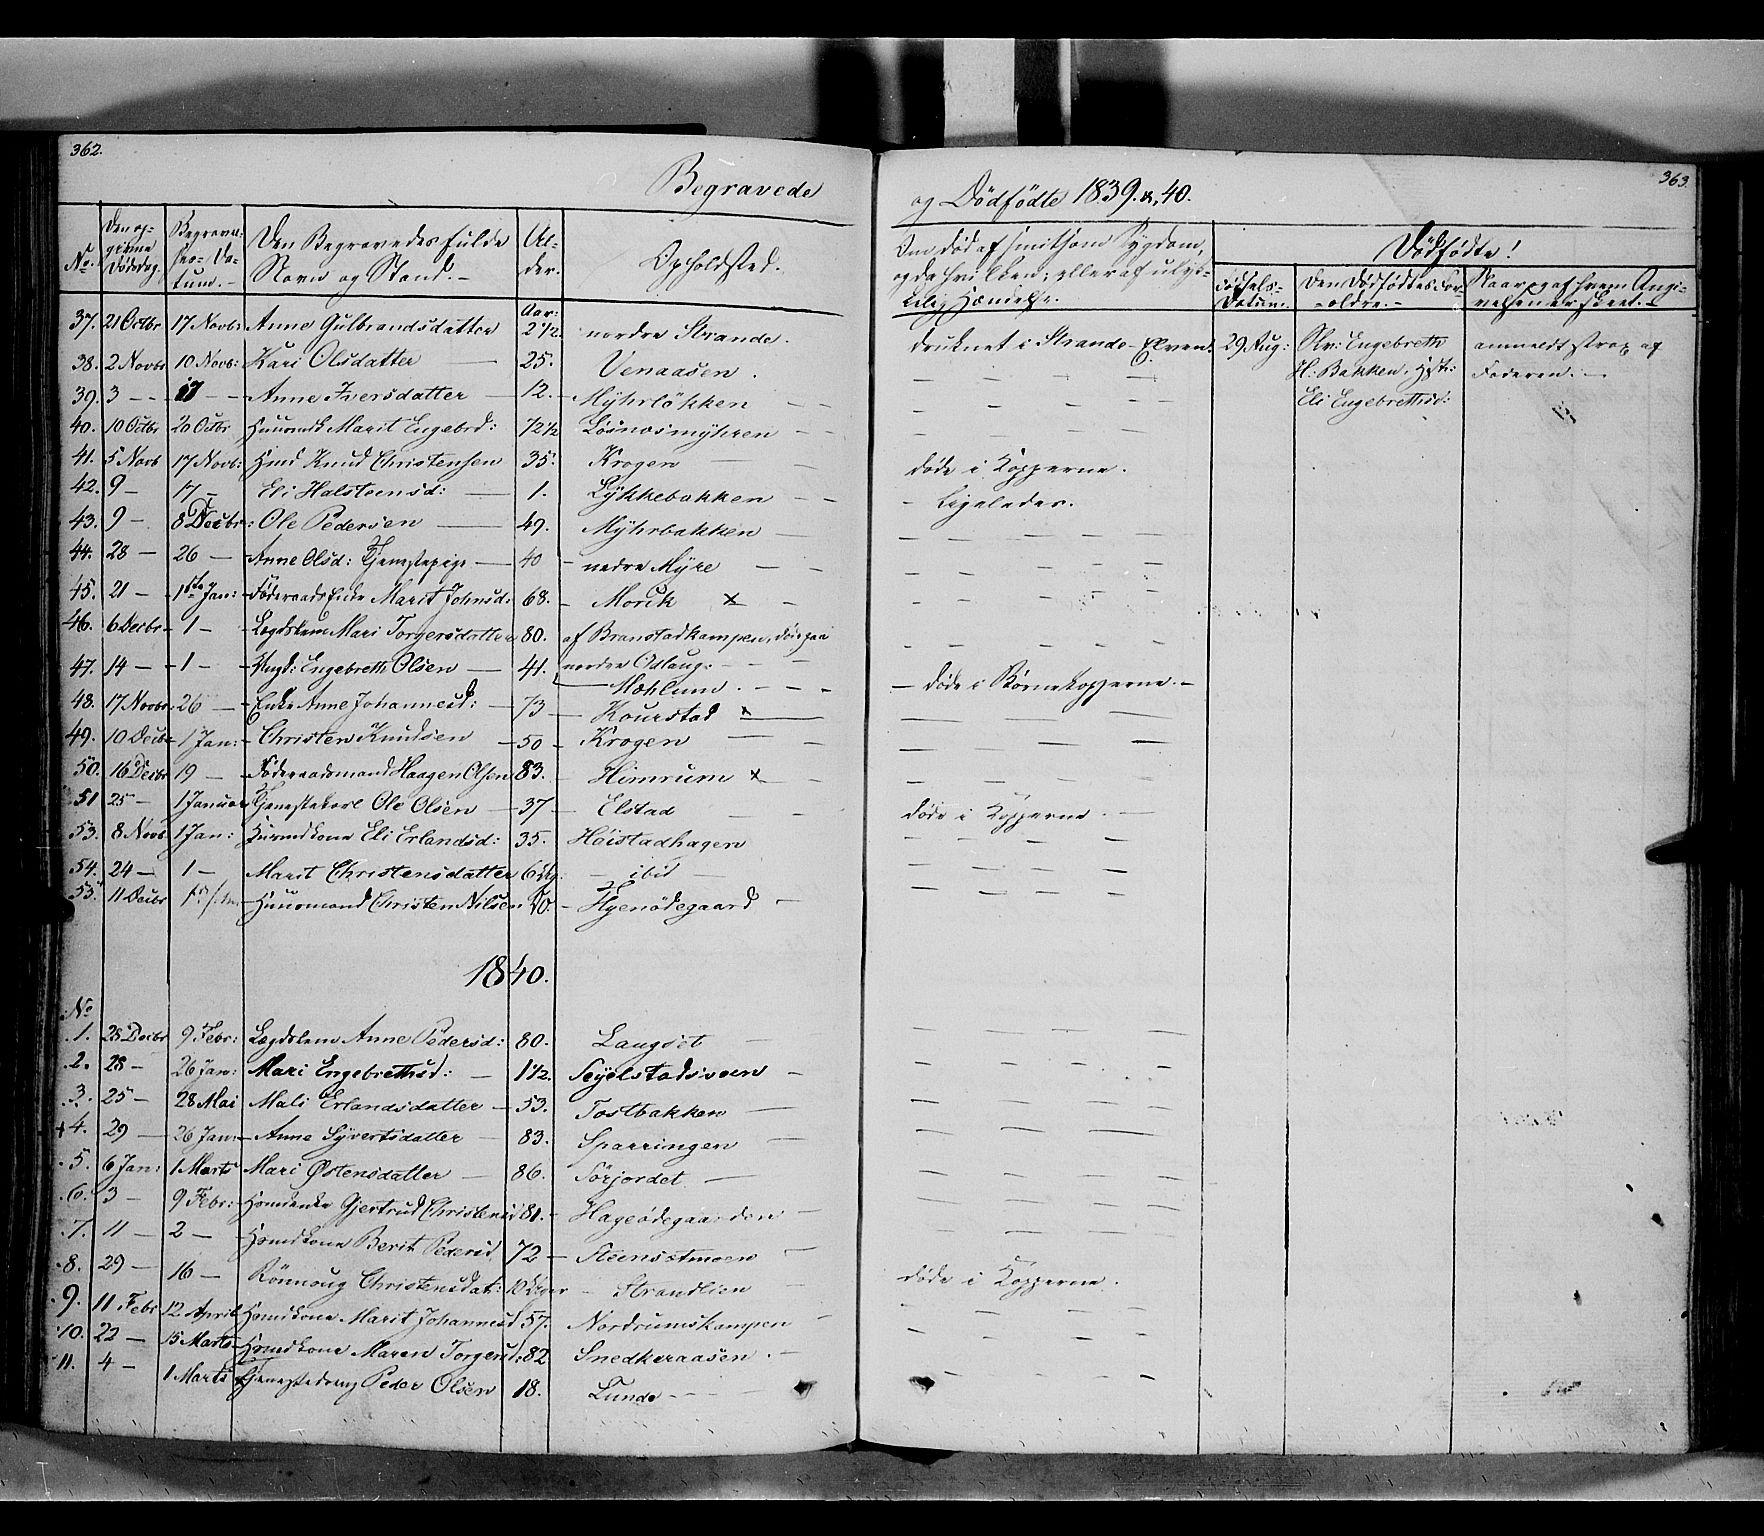 SAH, Ringebu prestekontor, Ministerialbok nr. 5, 1839-1848, s. 362-363